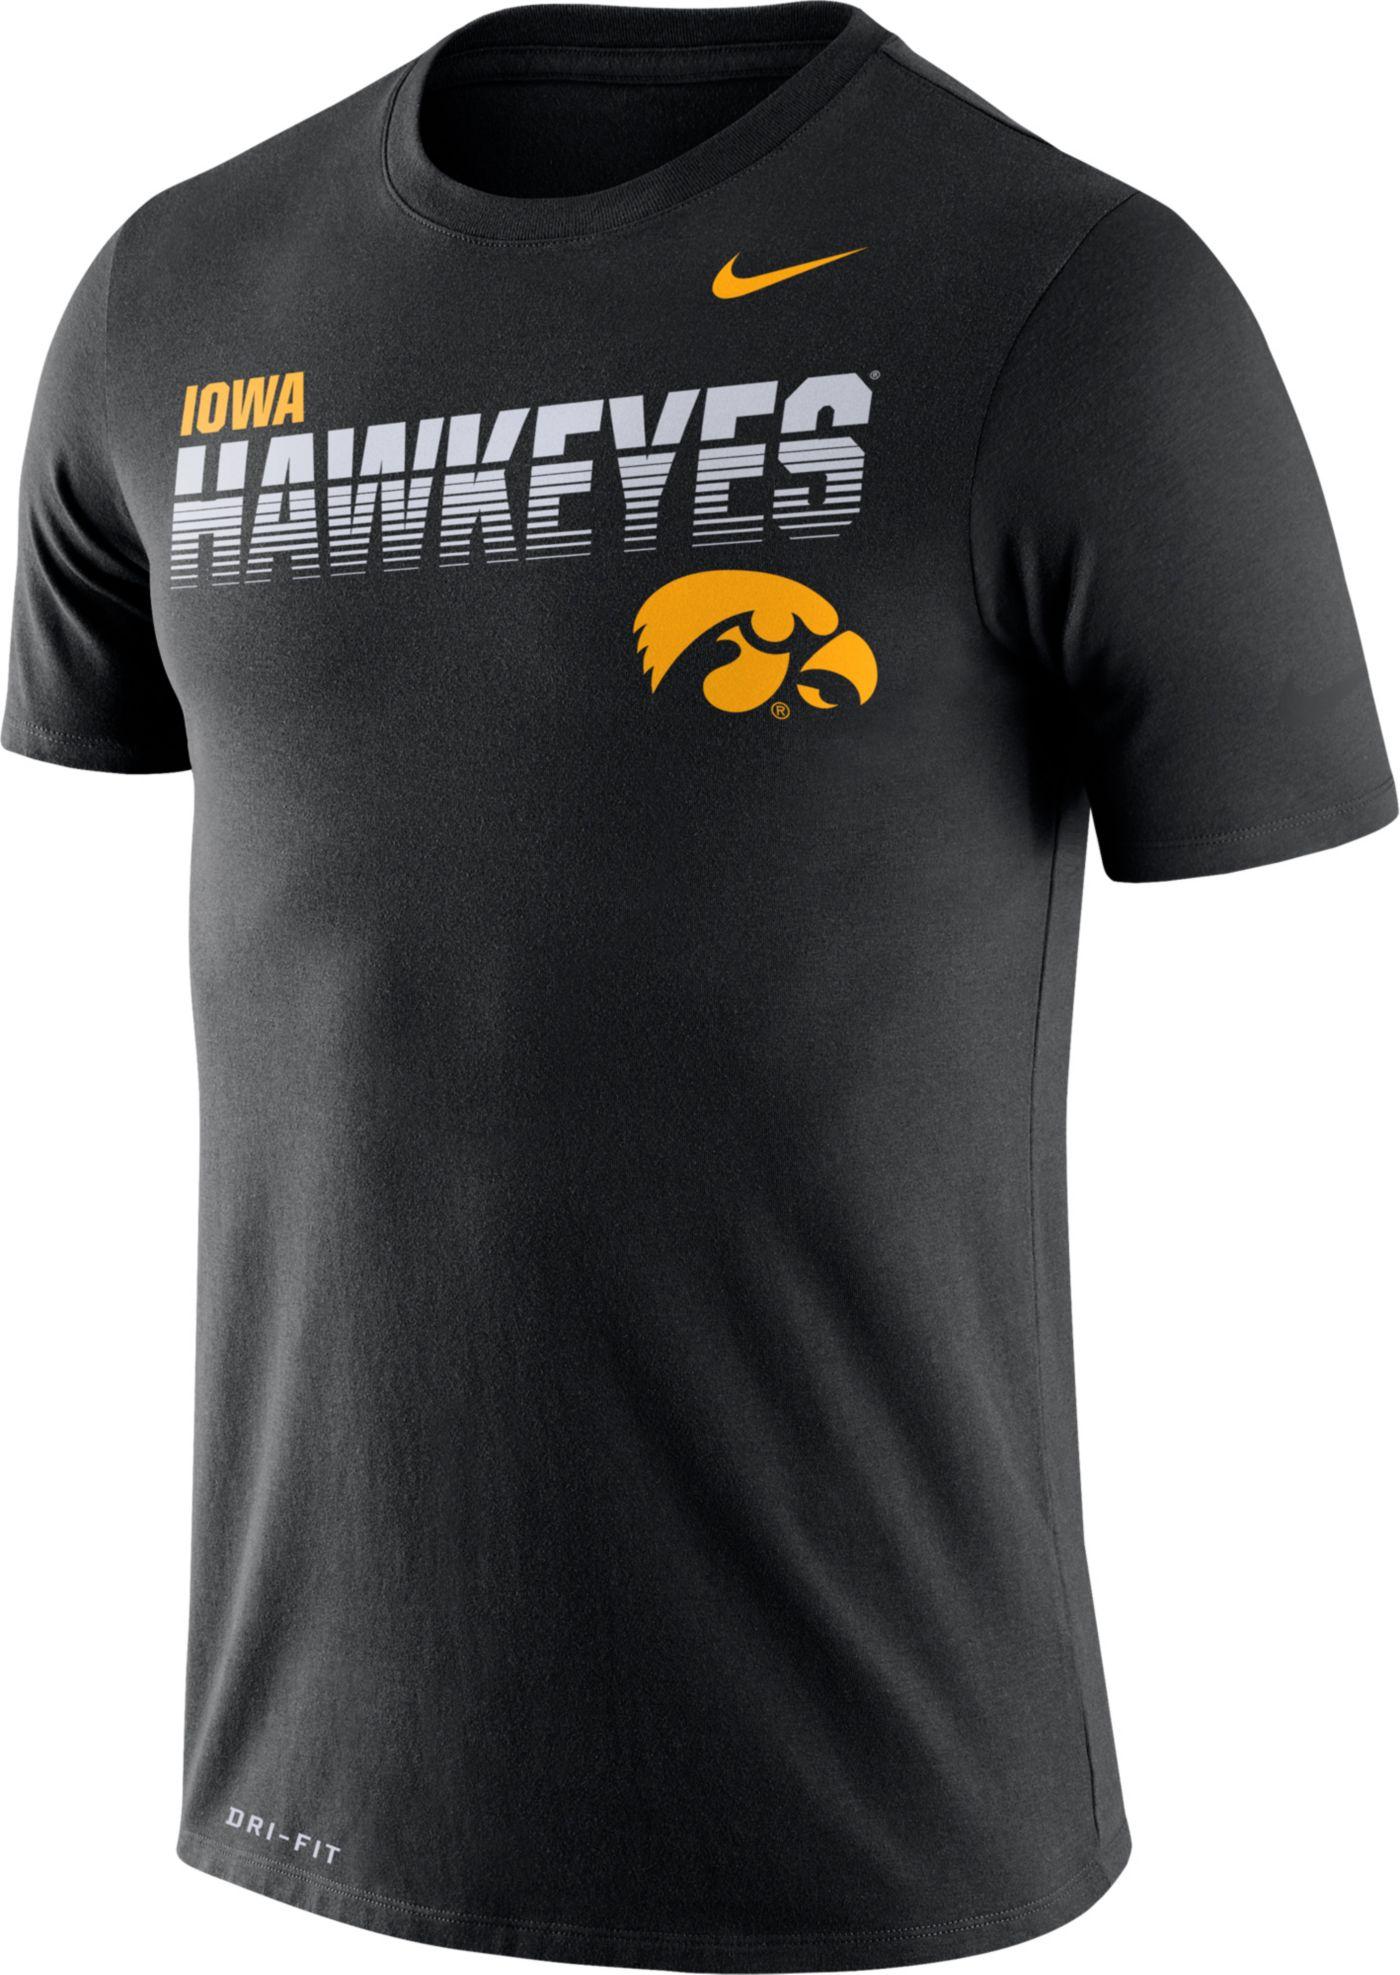 Nike Men's Iowa Hawkeyes Legend Football Sideline Black T-Shirt